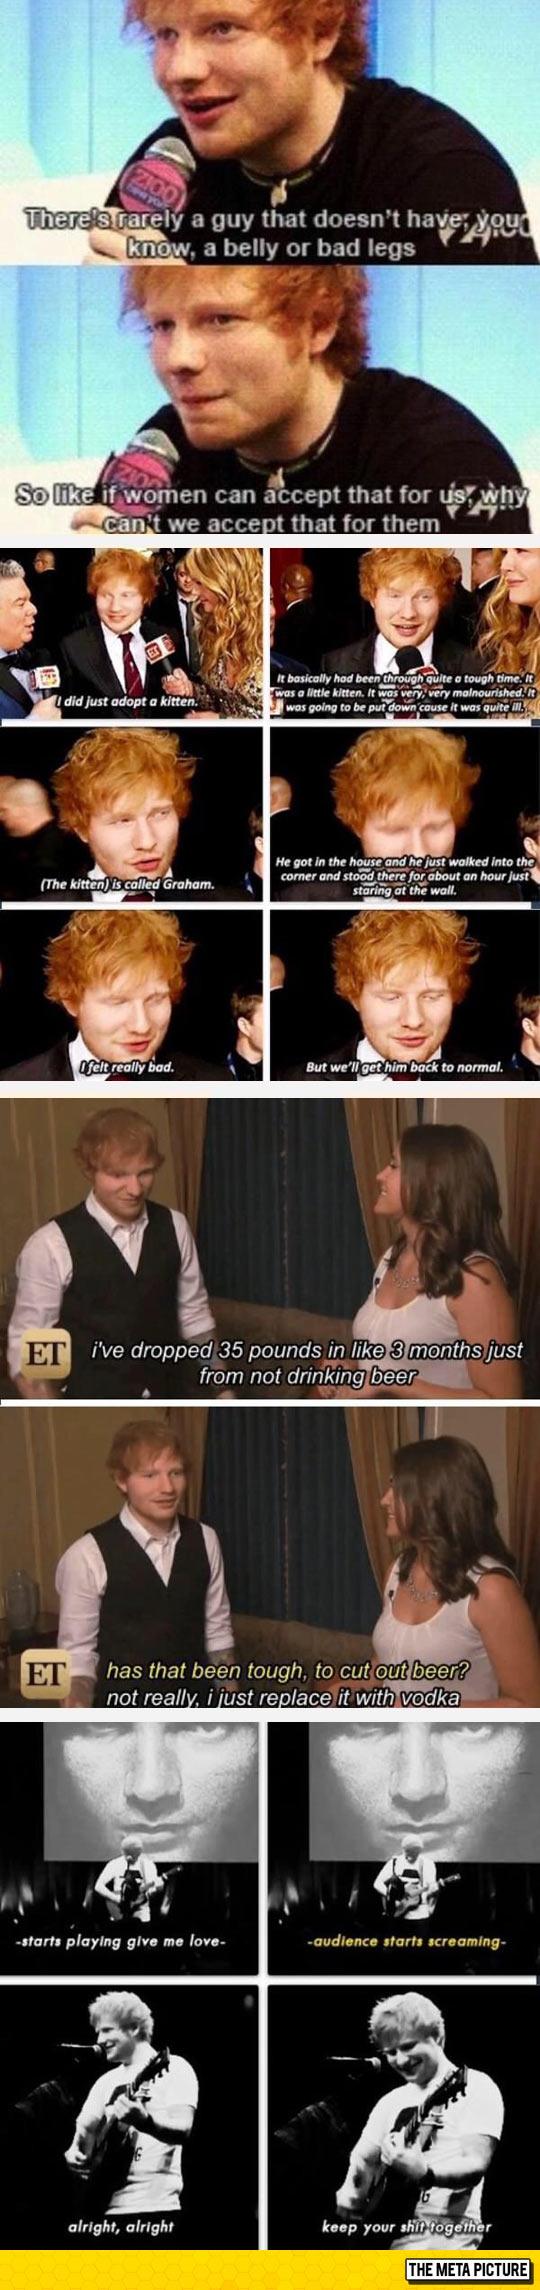 funny-Ed-Sheeran-music-stage